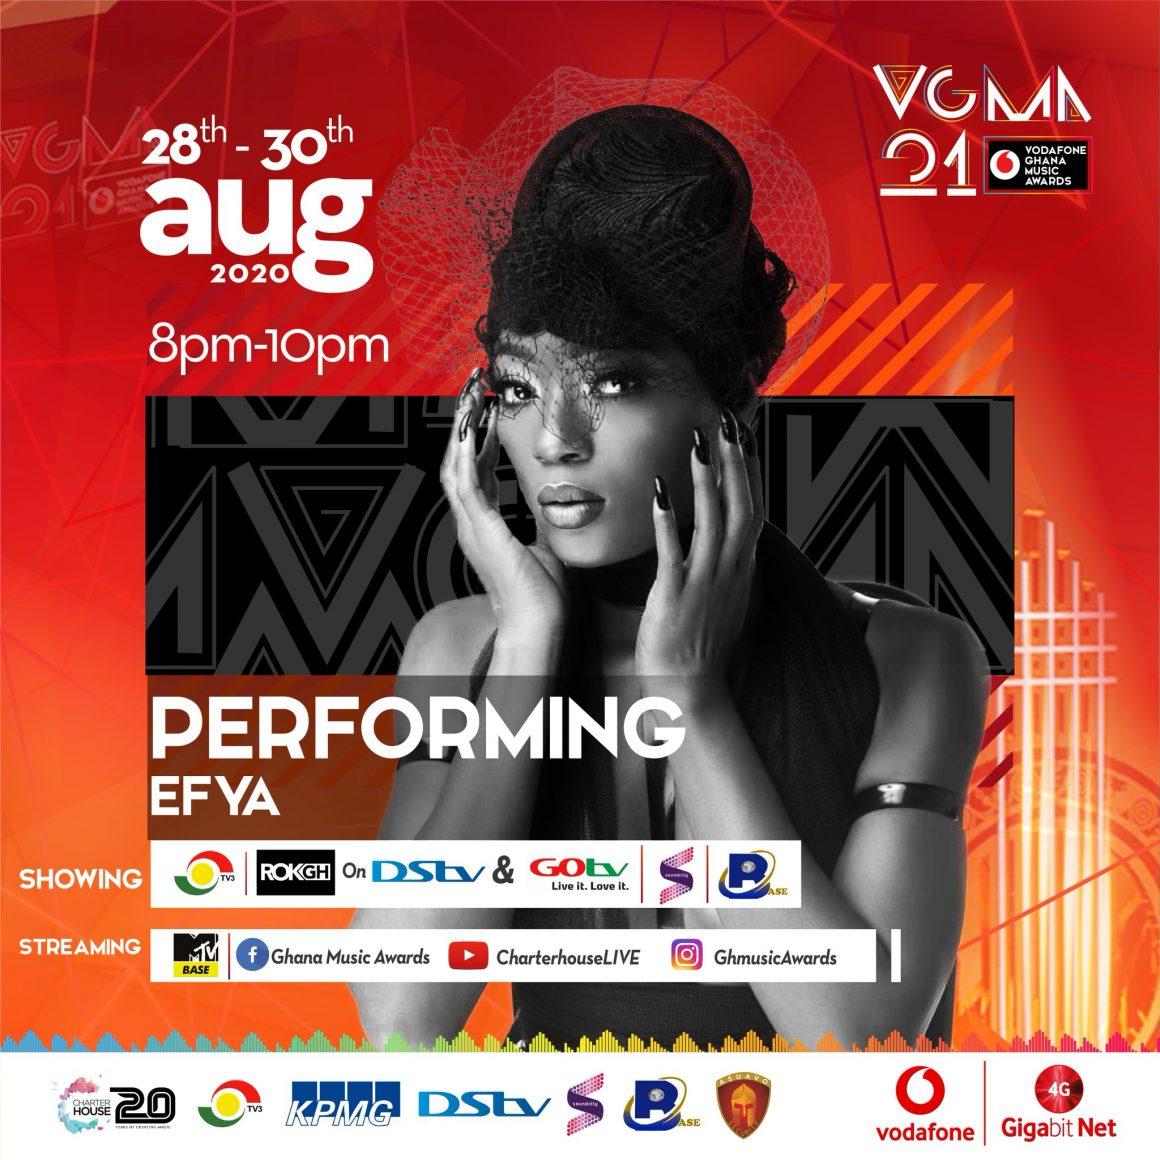 the-vodafone-ghana-music-awards-weekend-–-august-28-30